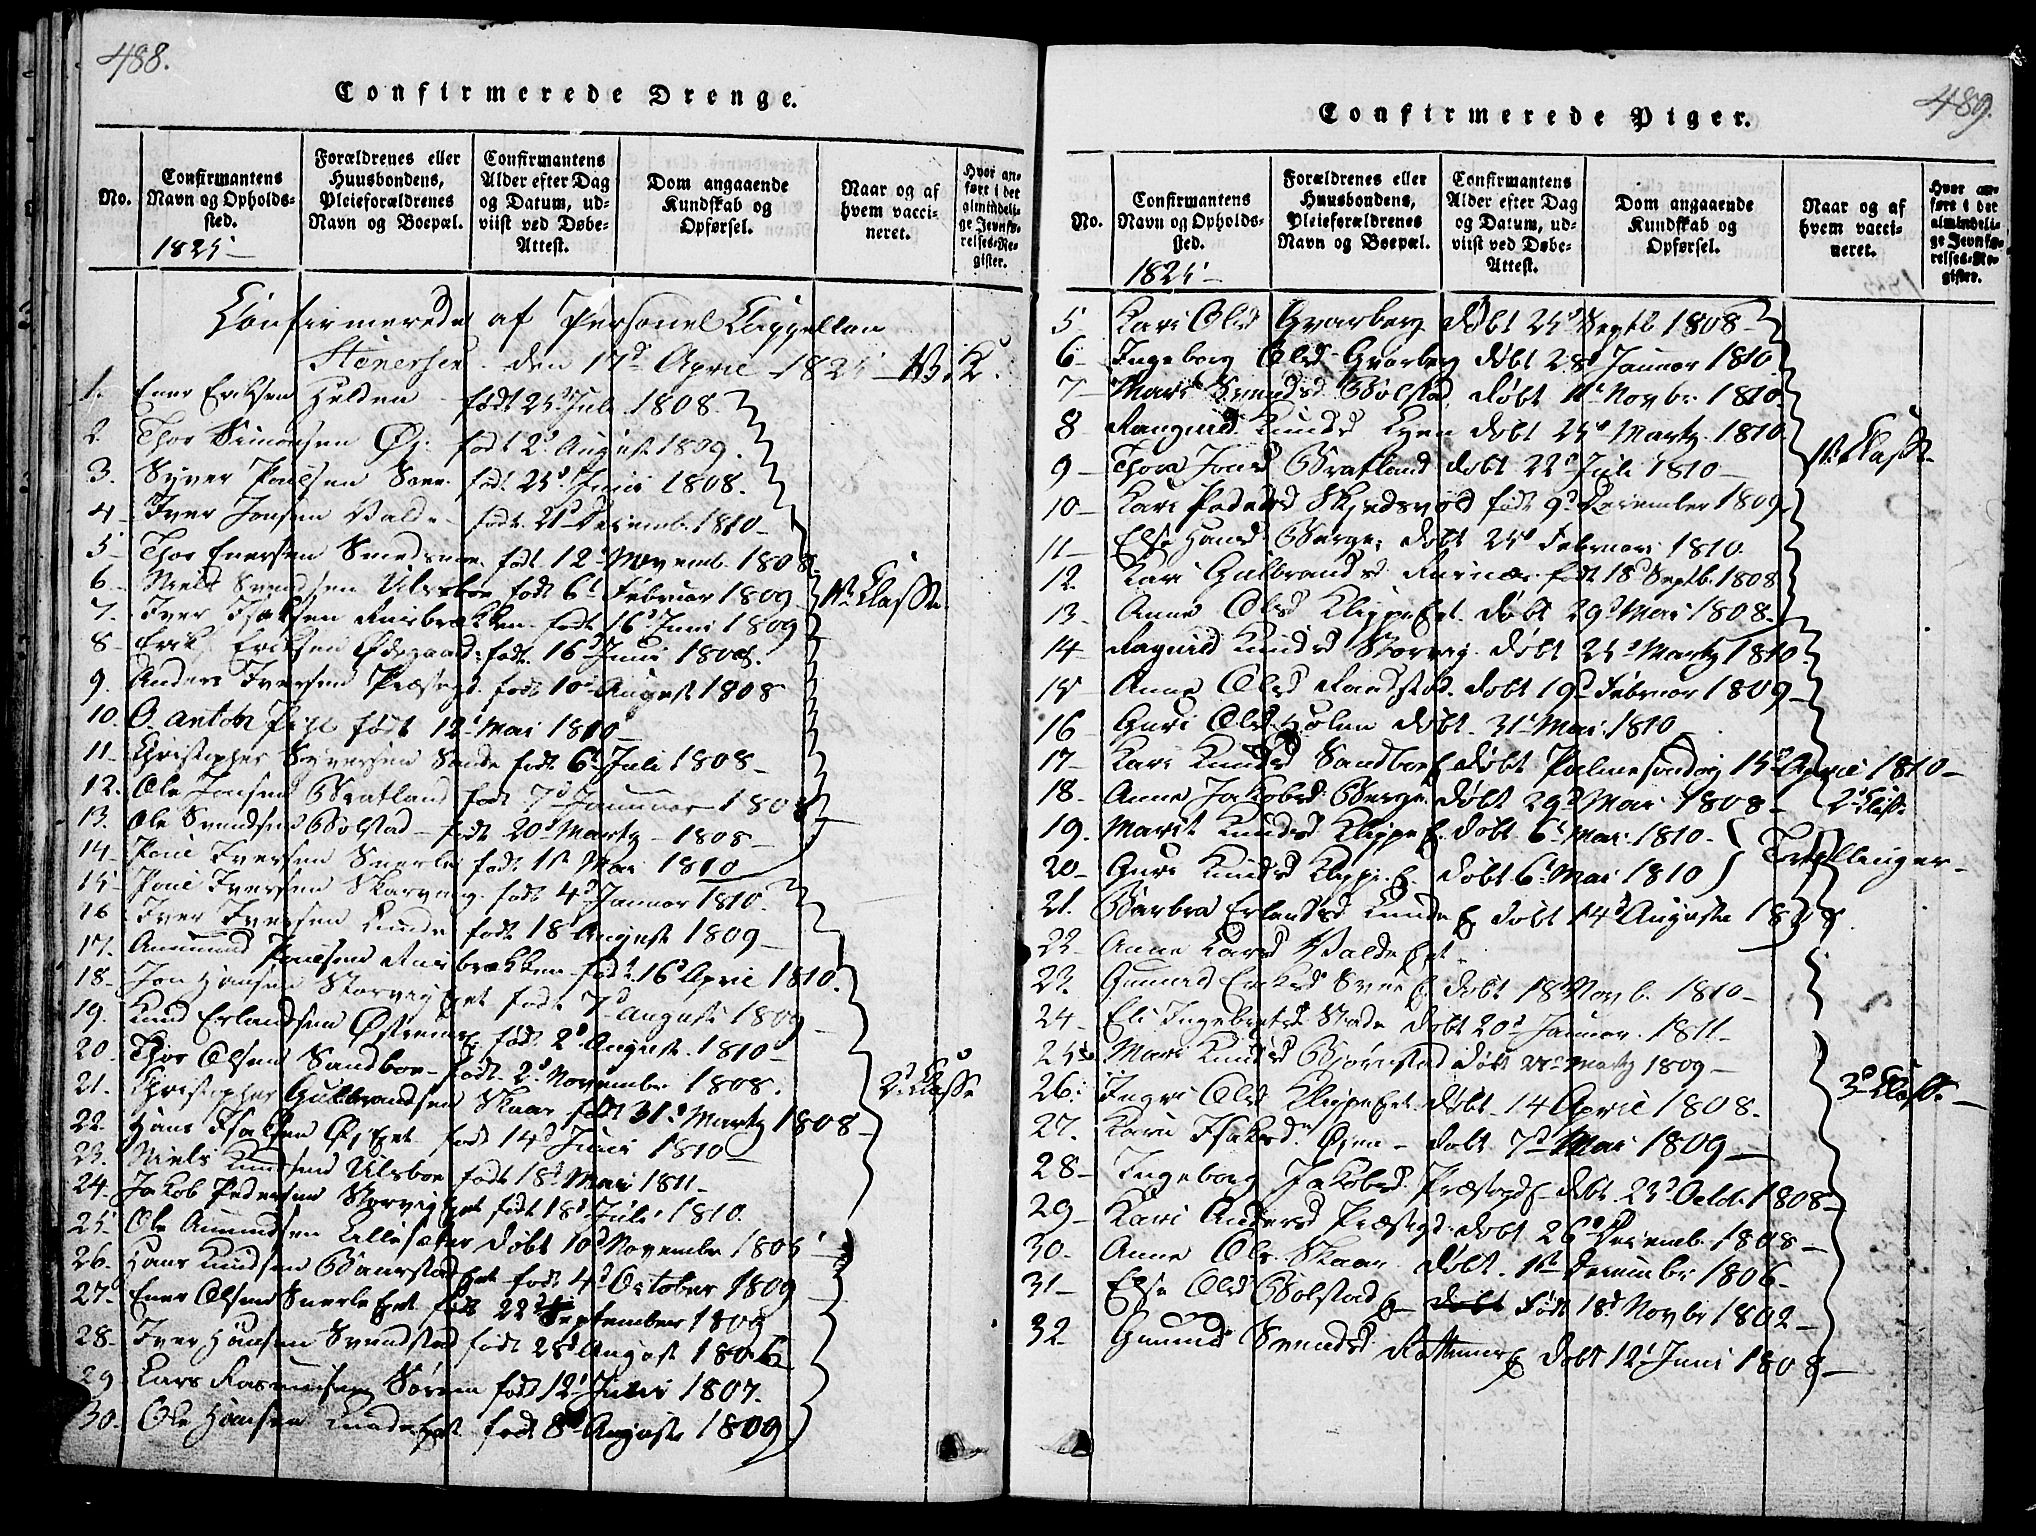 SAH, Vågå prestekontor, Ministerialbok nr. 3, 1815-1827, s. 488-489